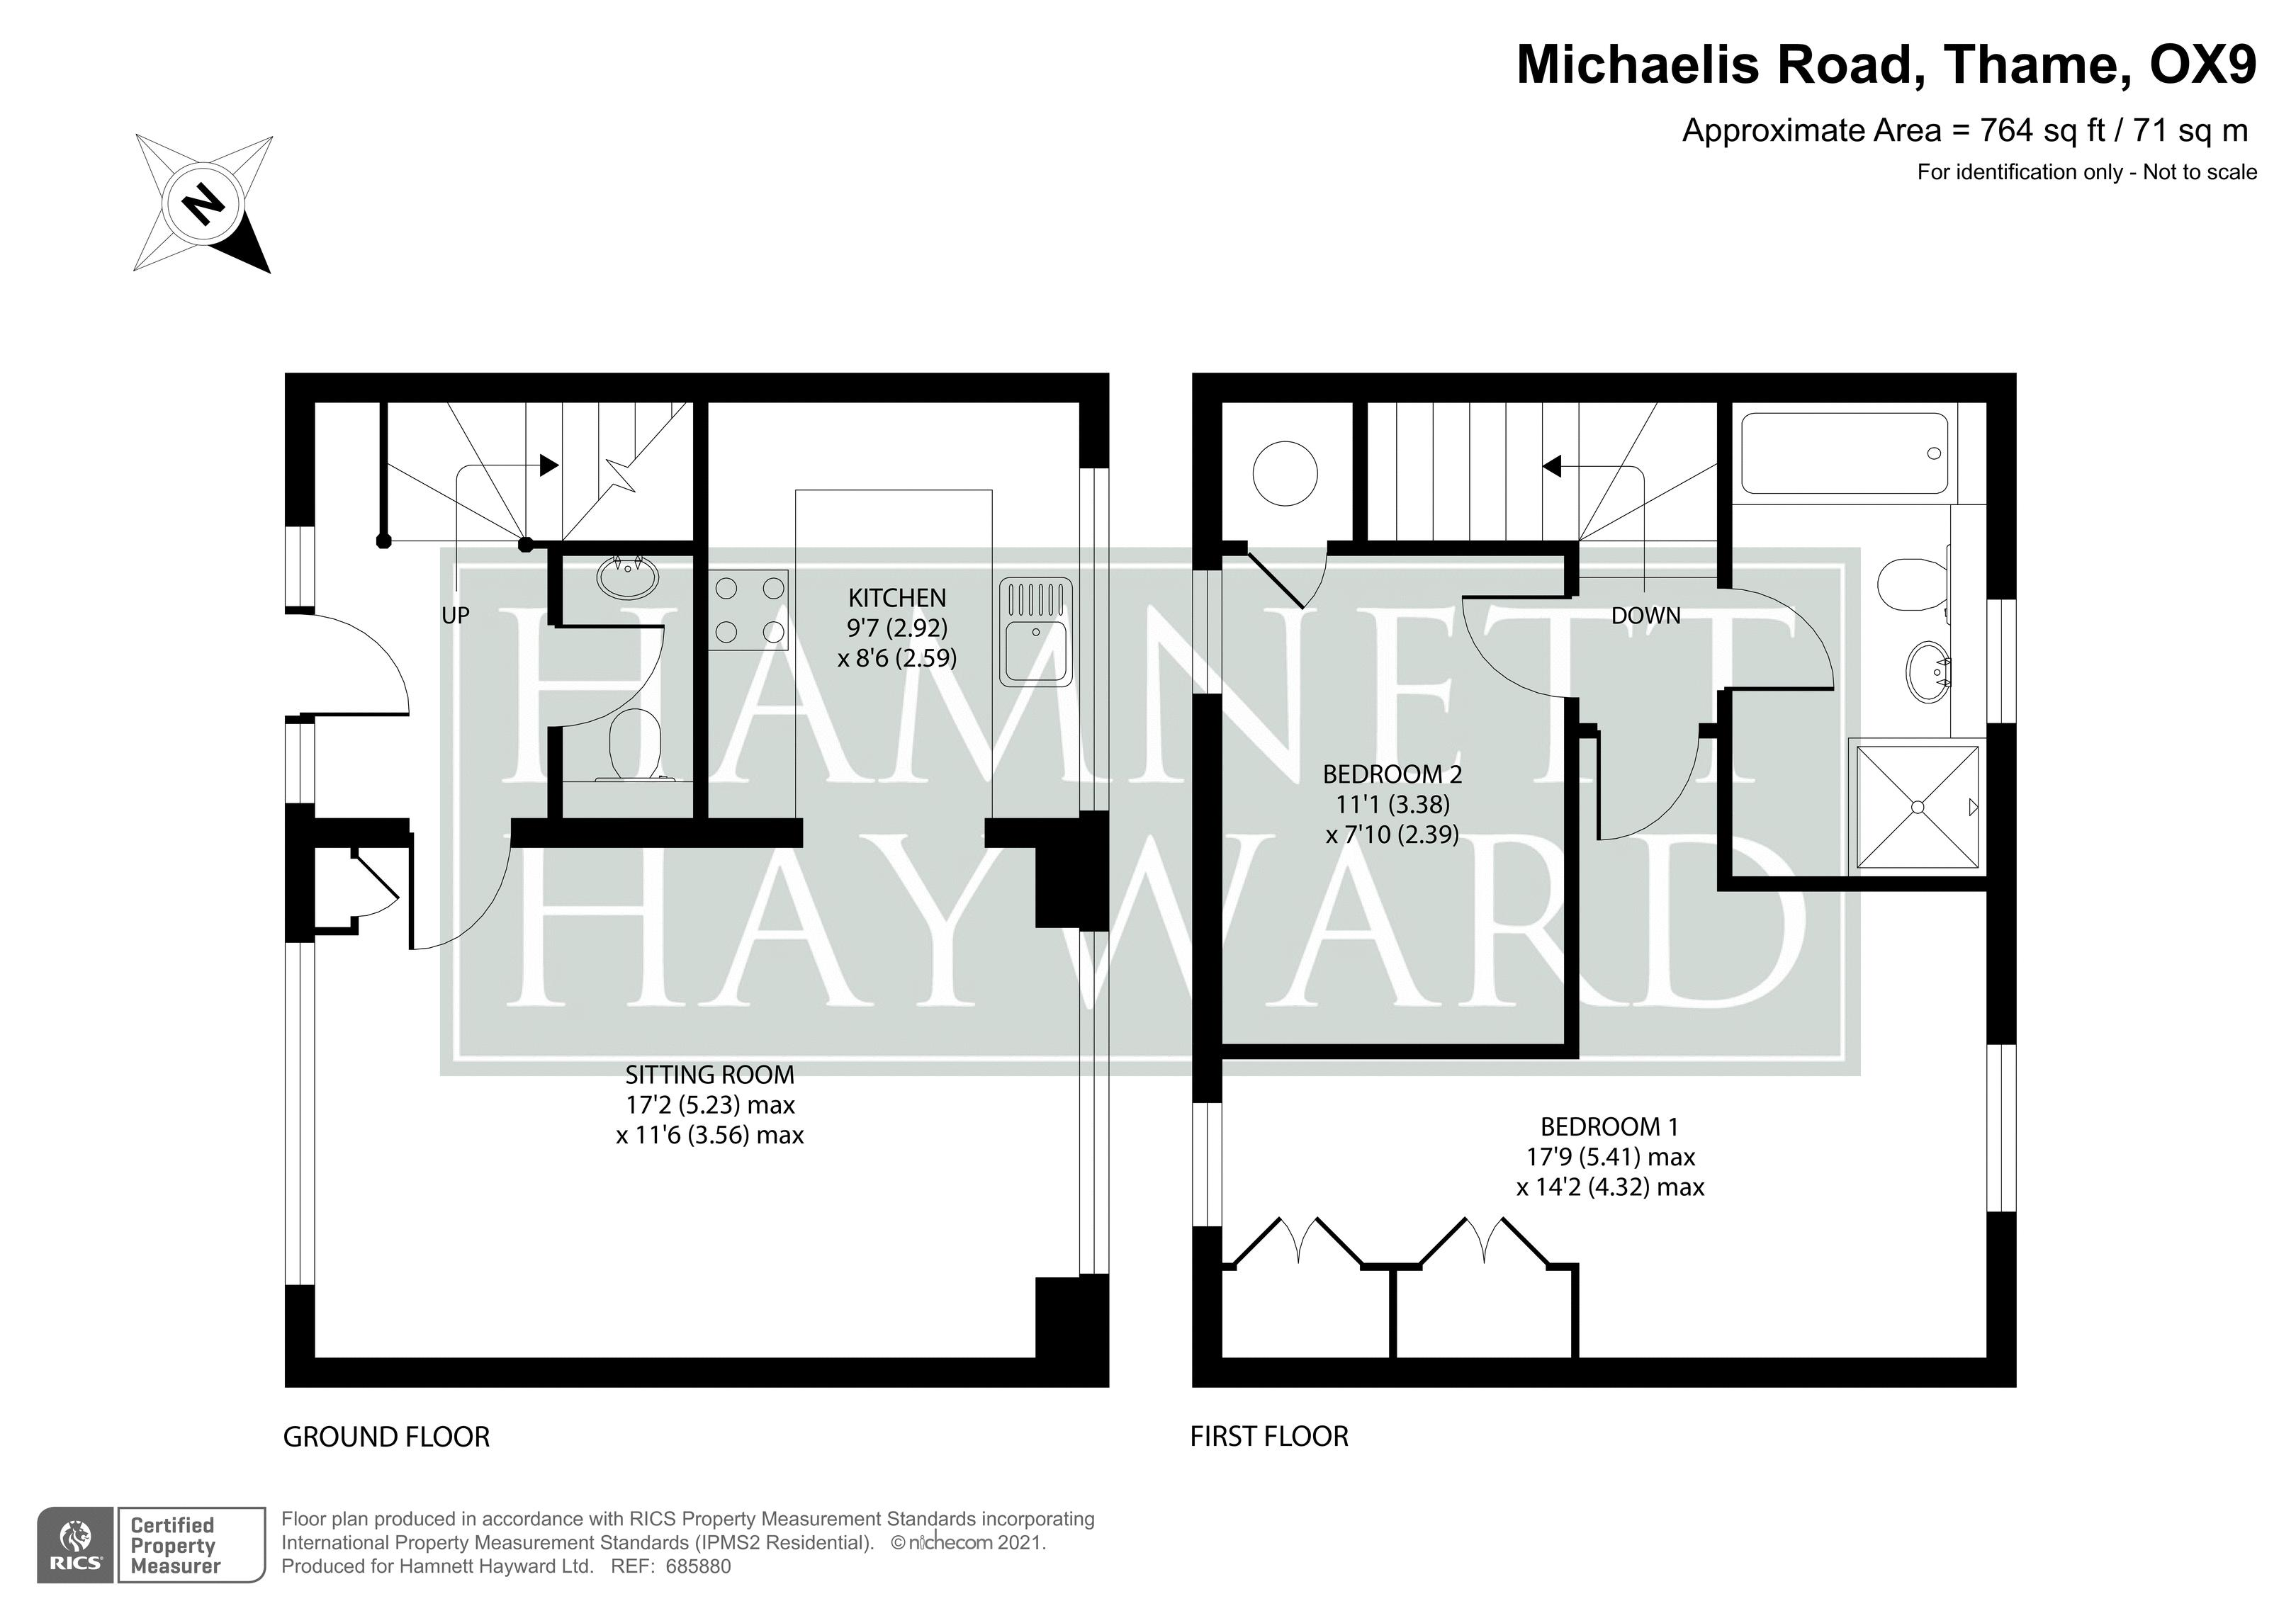 Michaelis Road